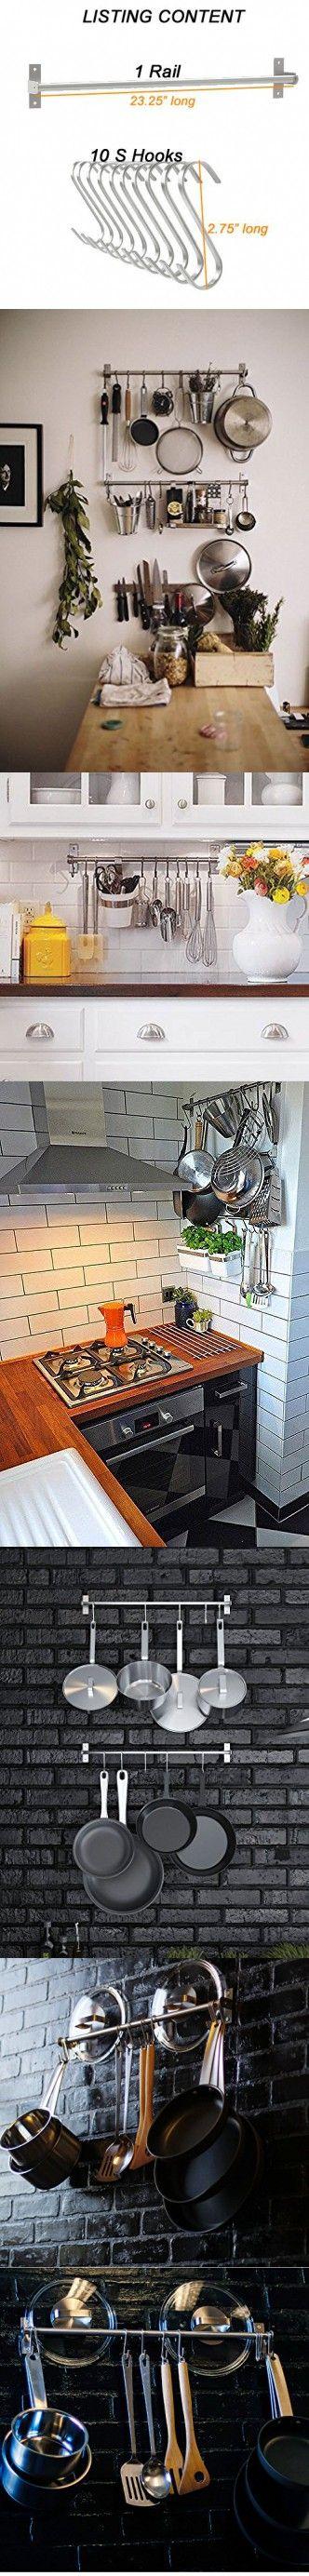 Stainless Steel Gourmet Kitchen 23.25 Inch Wall Rail Pot Pan Utensil Lid Rack Storage Organizer with 10 S Hooks